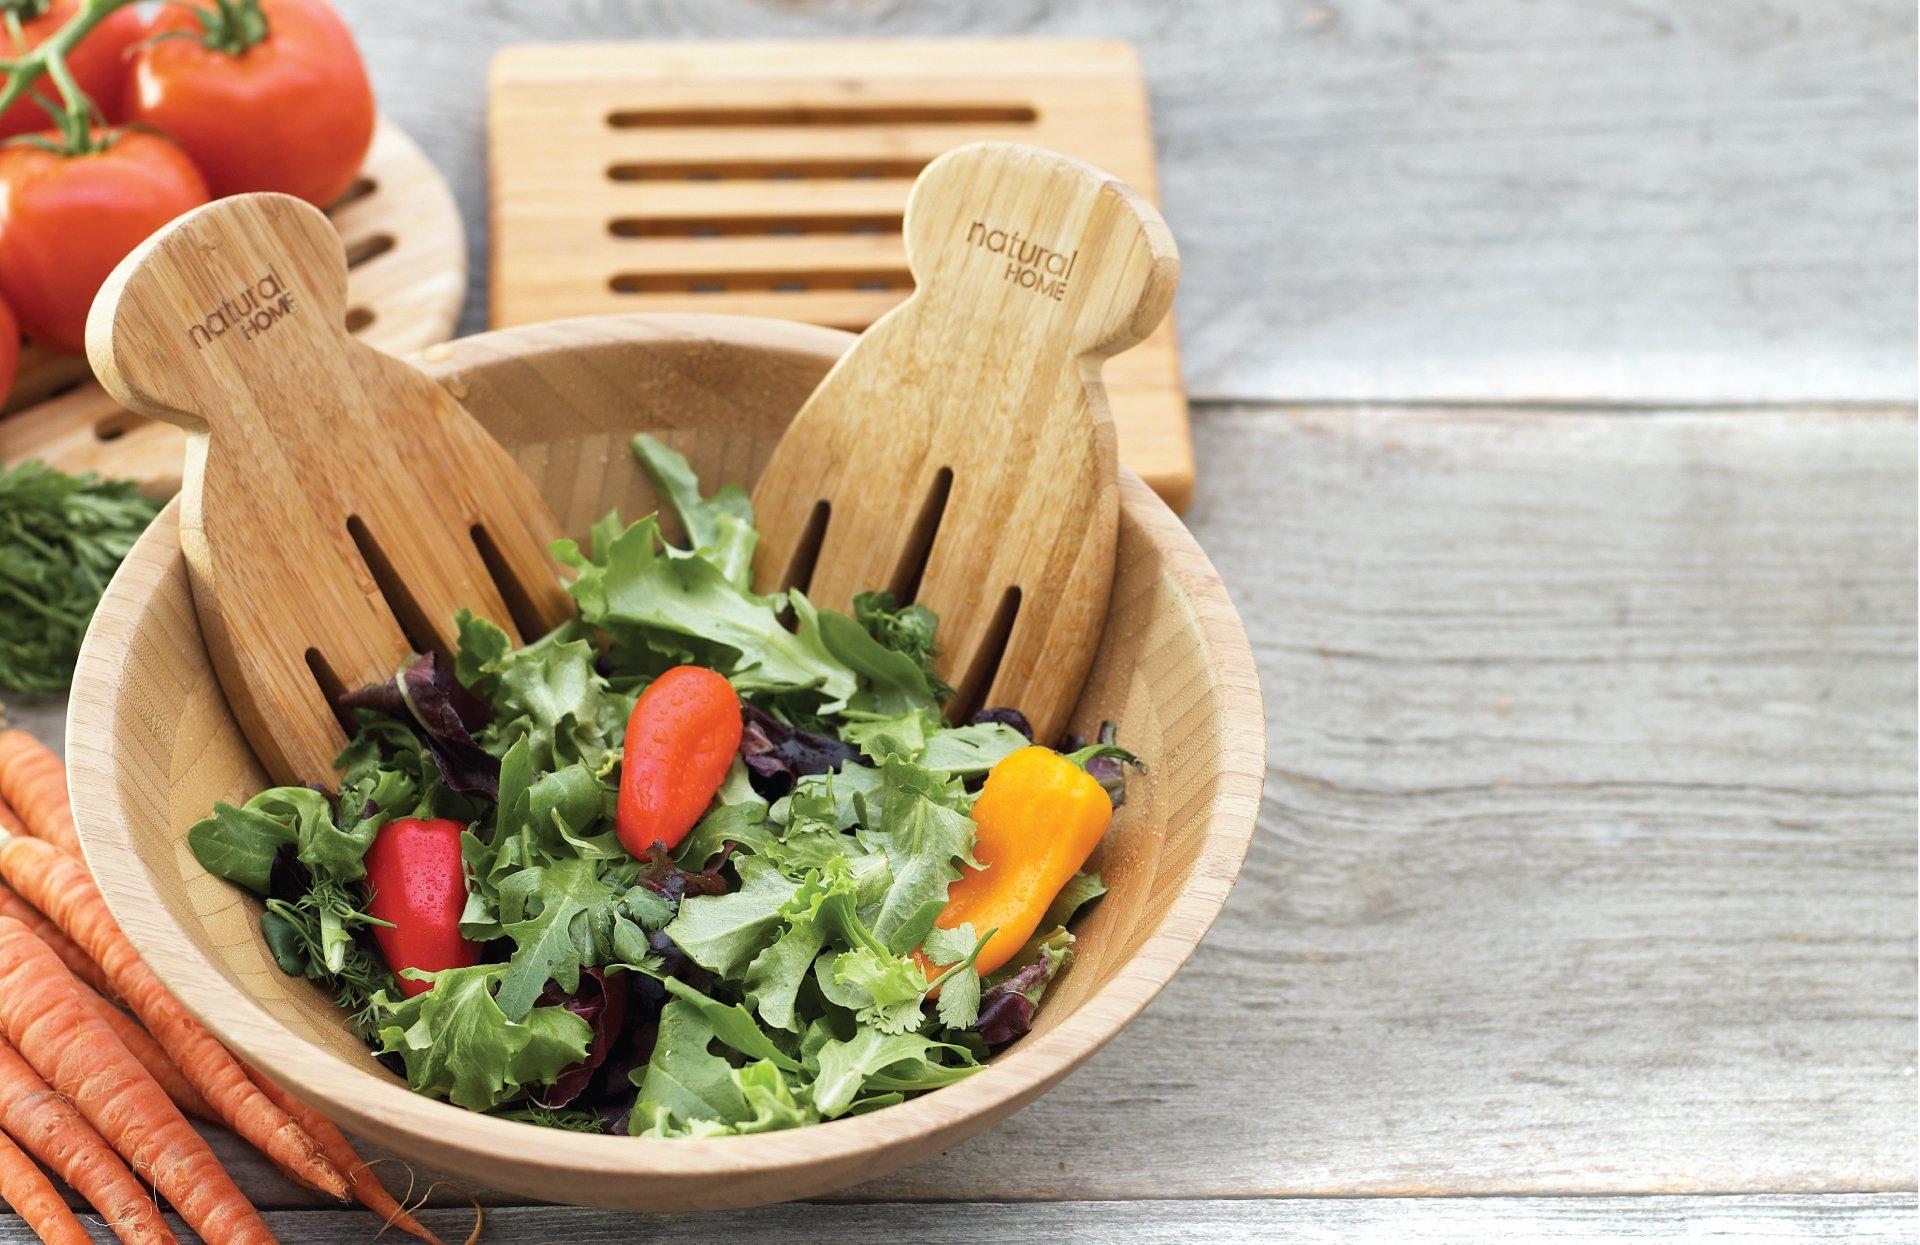 Natural Home Bamboo Salad Hands Set